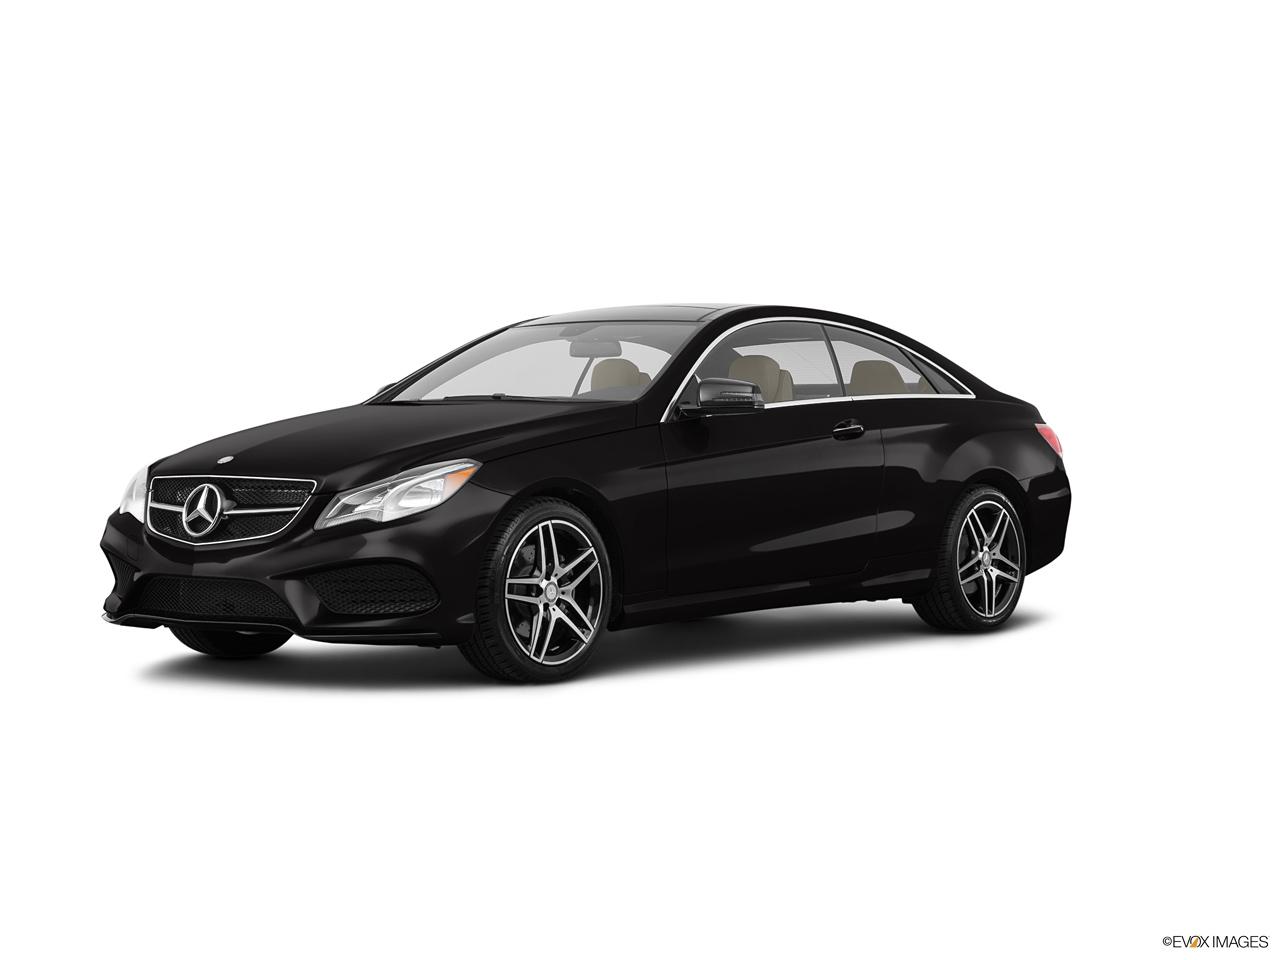 Car Pictures List For Mercedes Benz E Class Coupe 2017 E